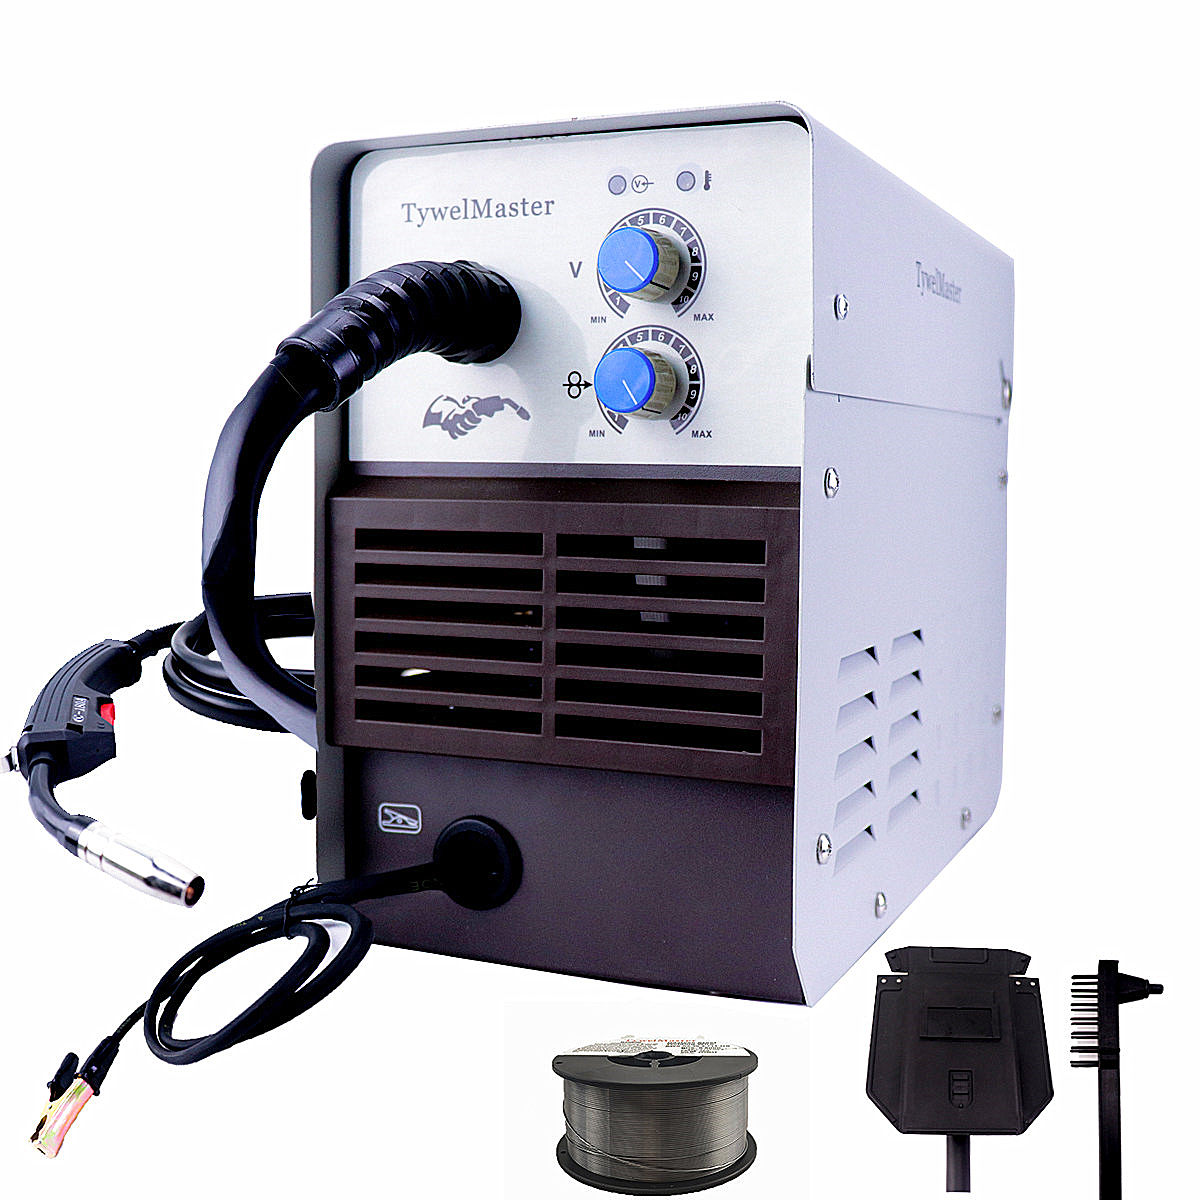 Gasless MIG Welding Machine 120A 230V Inverter IGBT 1kg Mini Spool Self Shield E71T-GS Flux Cored Arc Wire No Gas MIG Welder